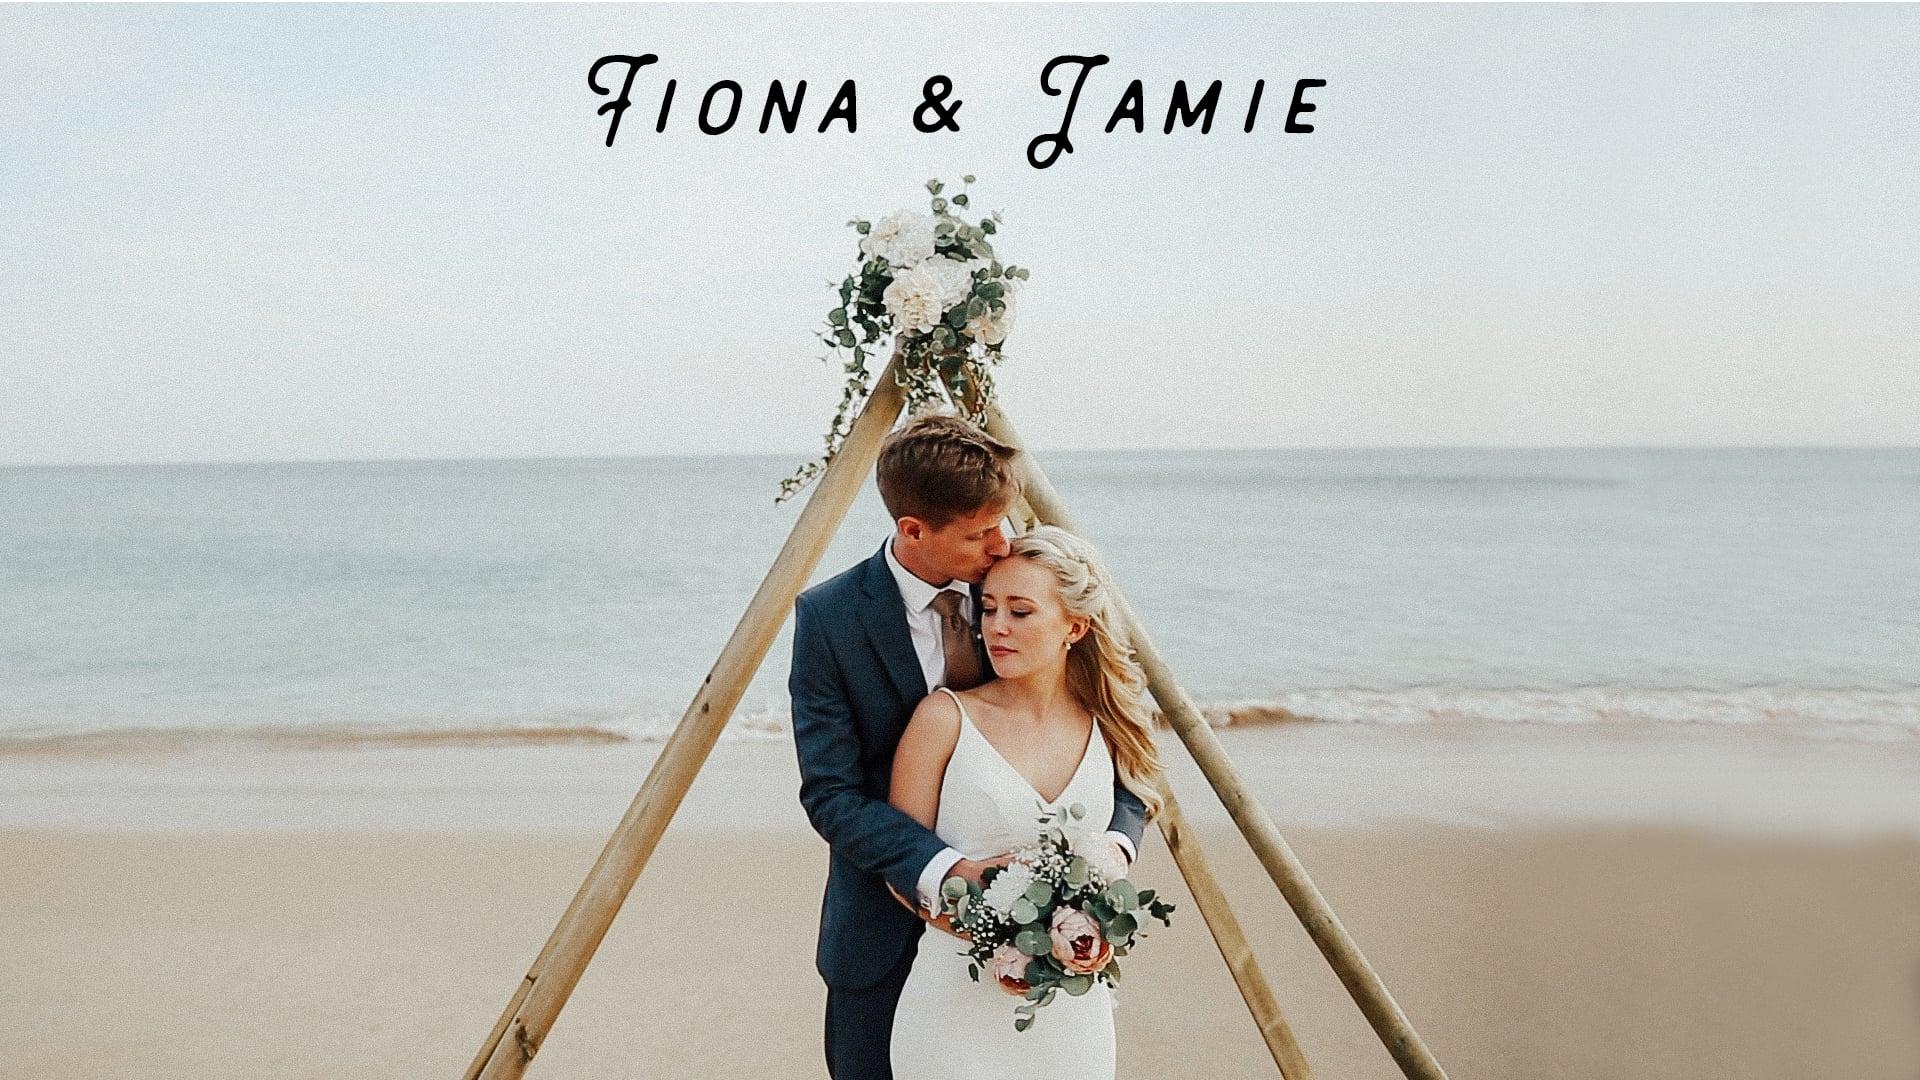 Fiona & Jamie